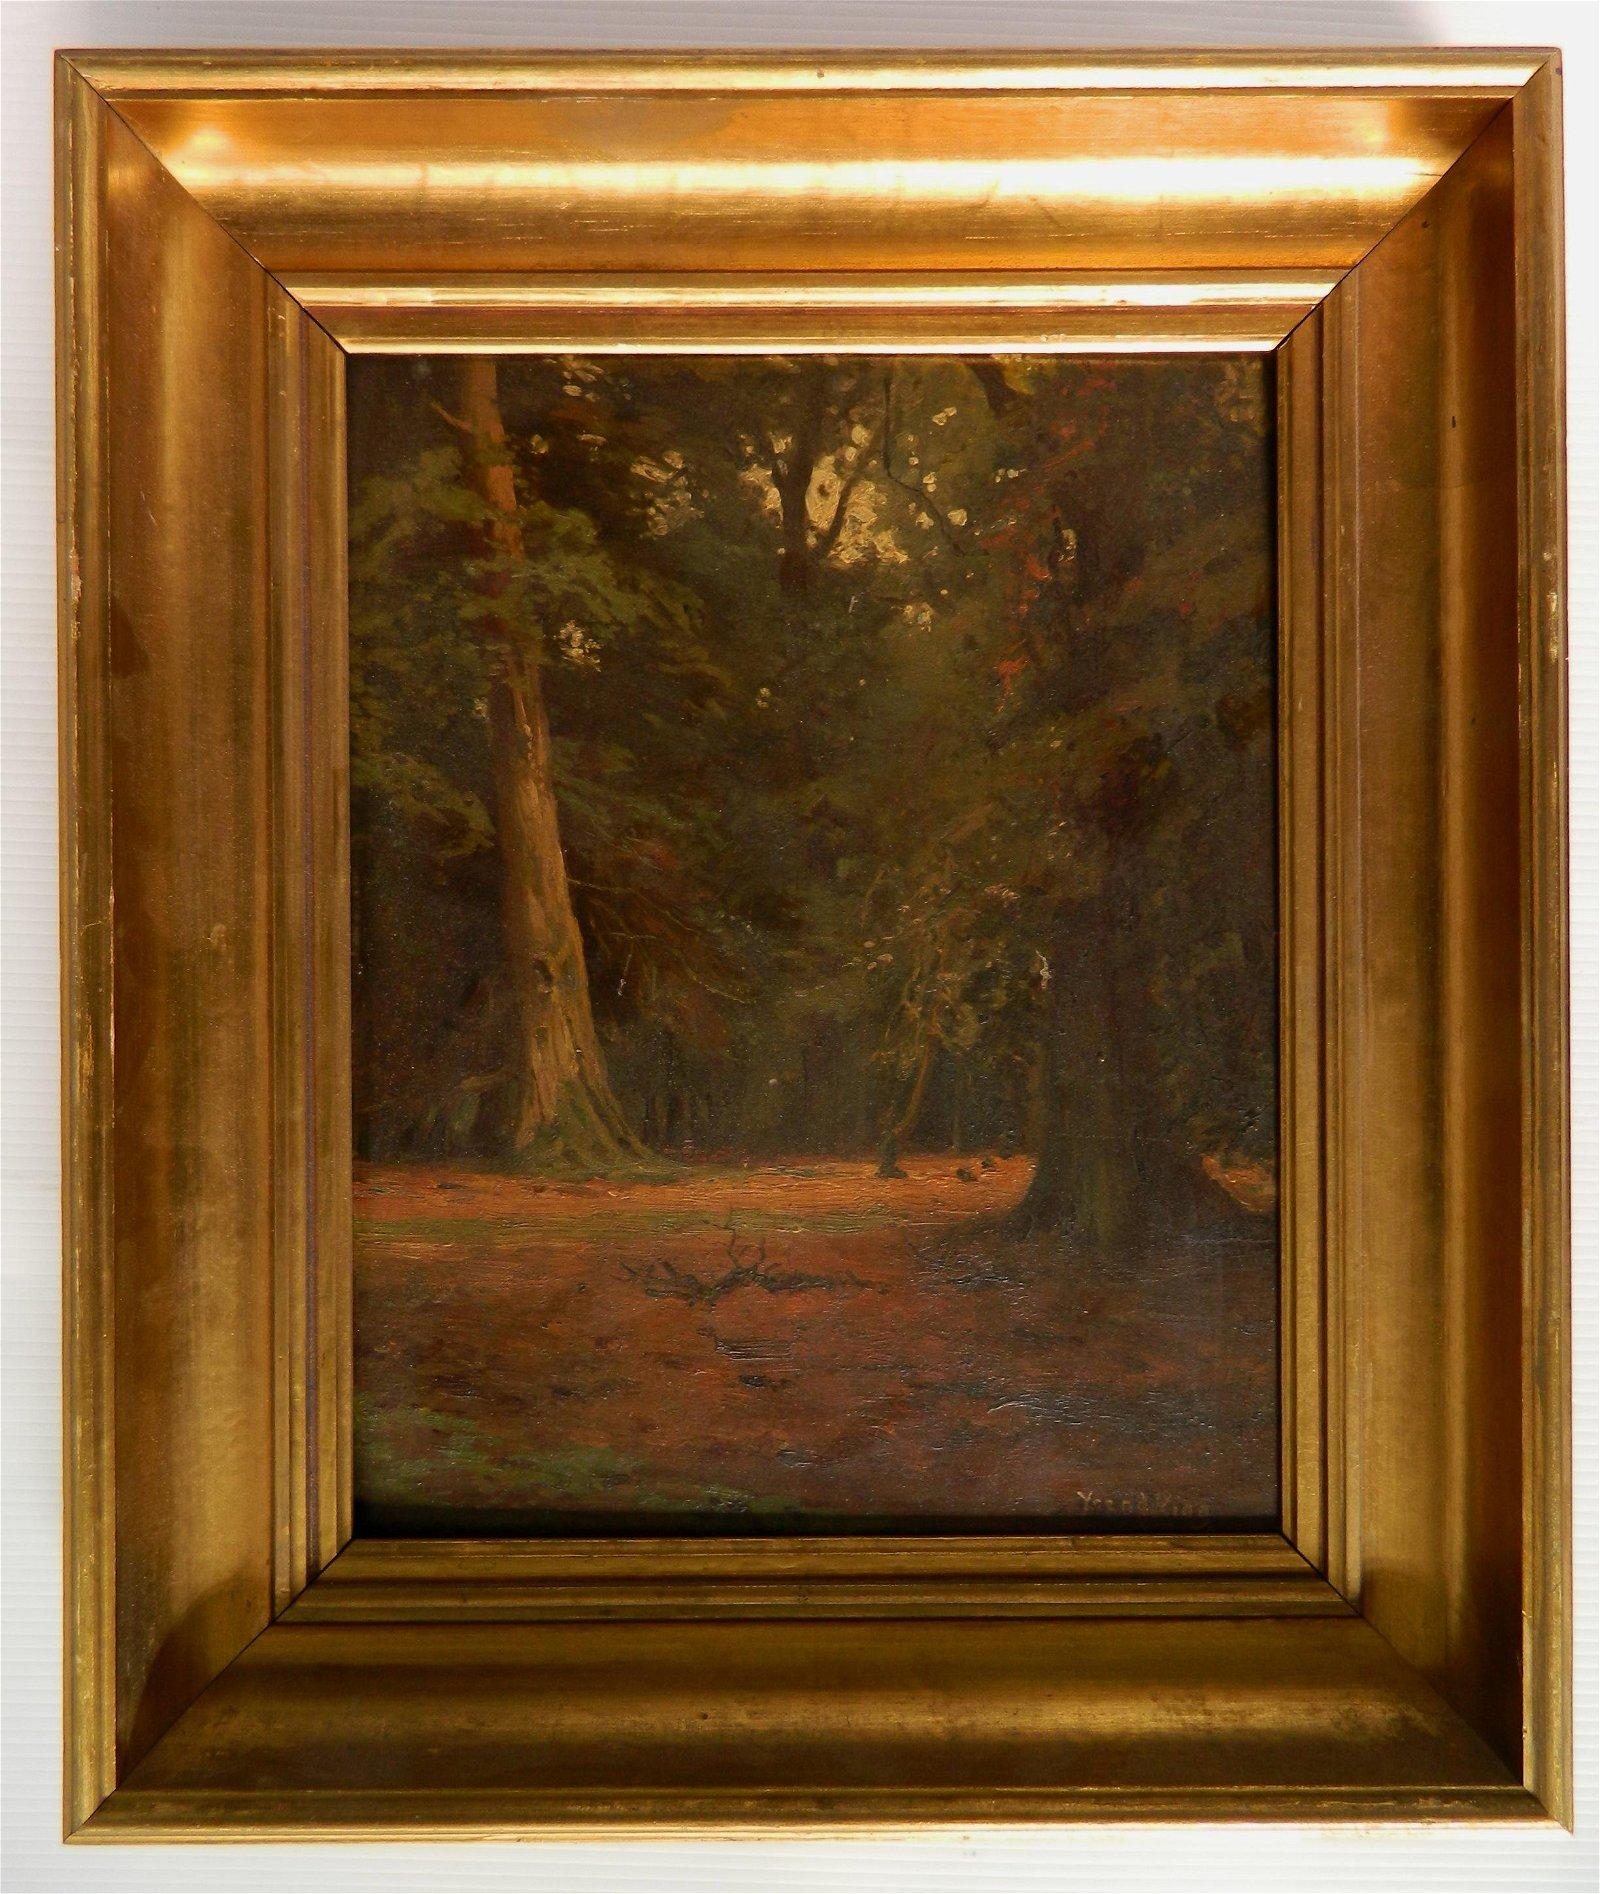 Henry John Yeend-King oil